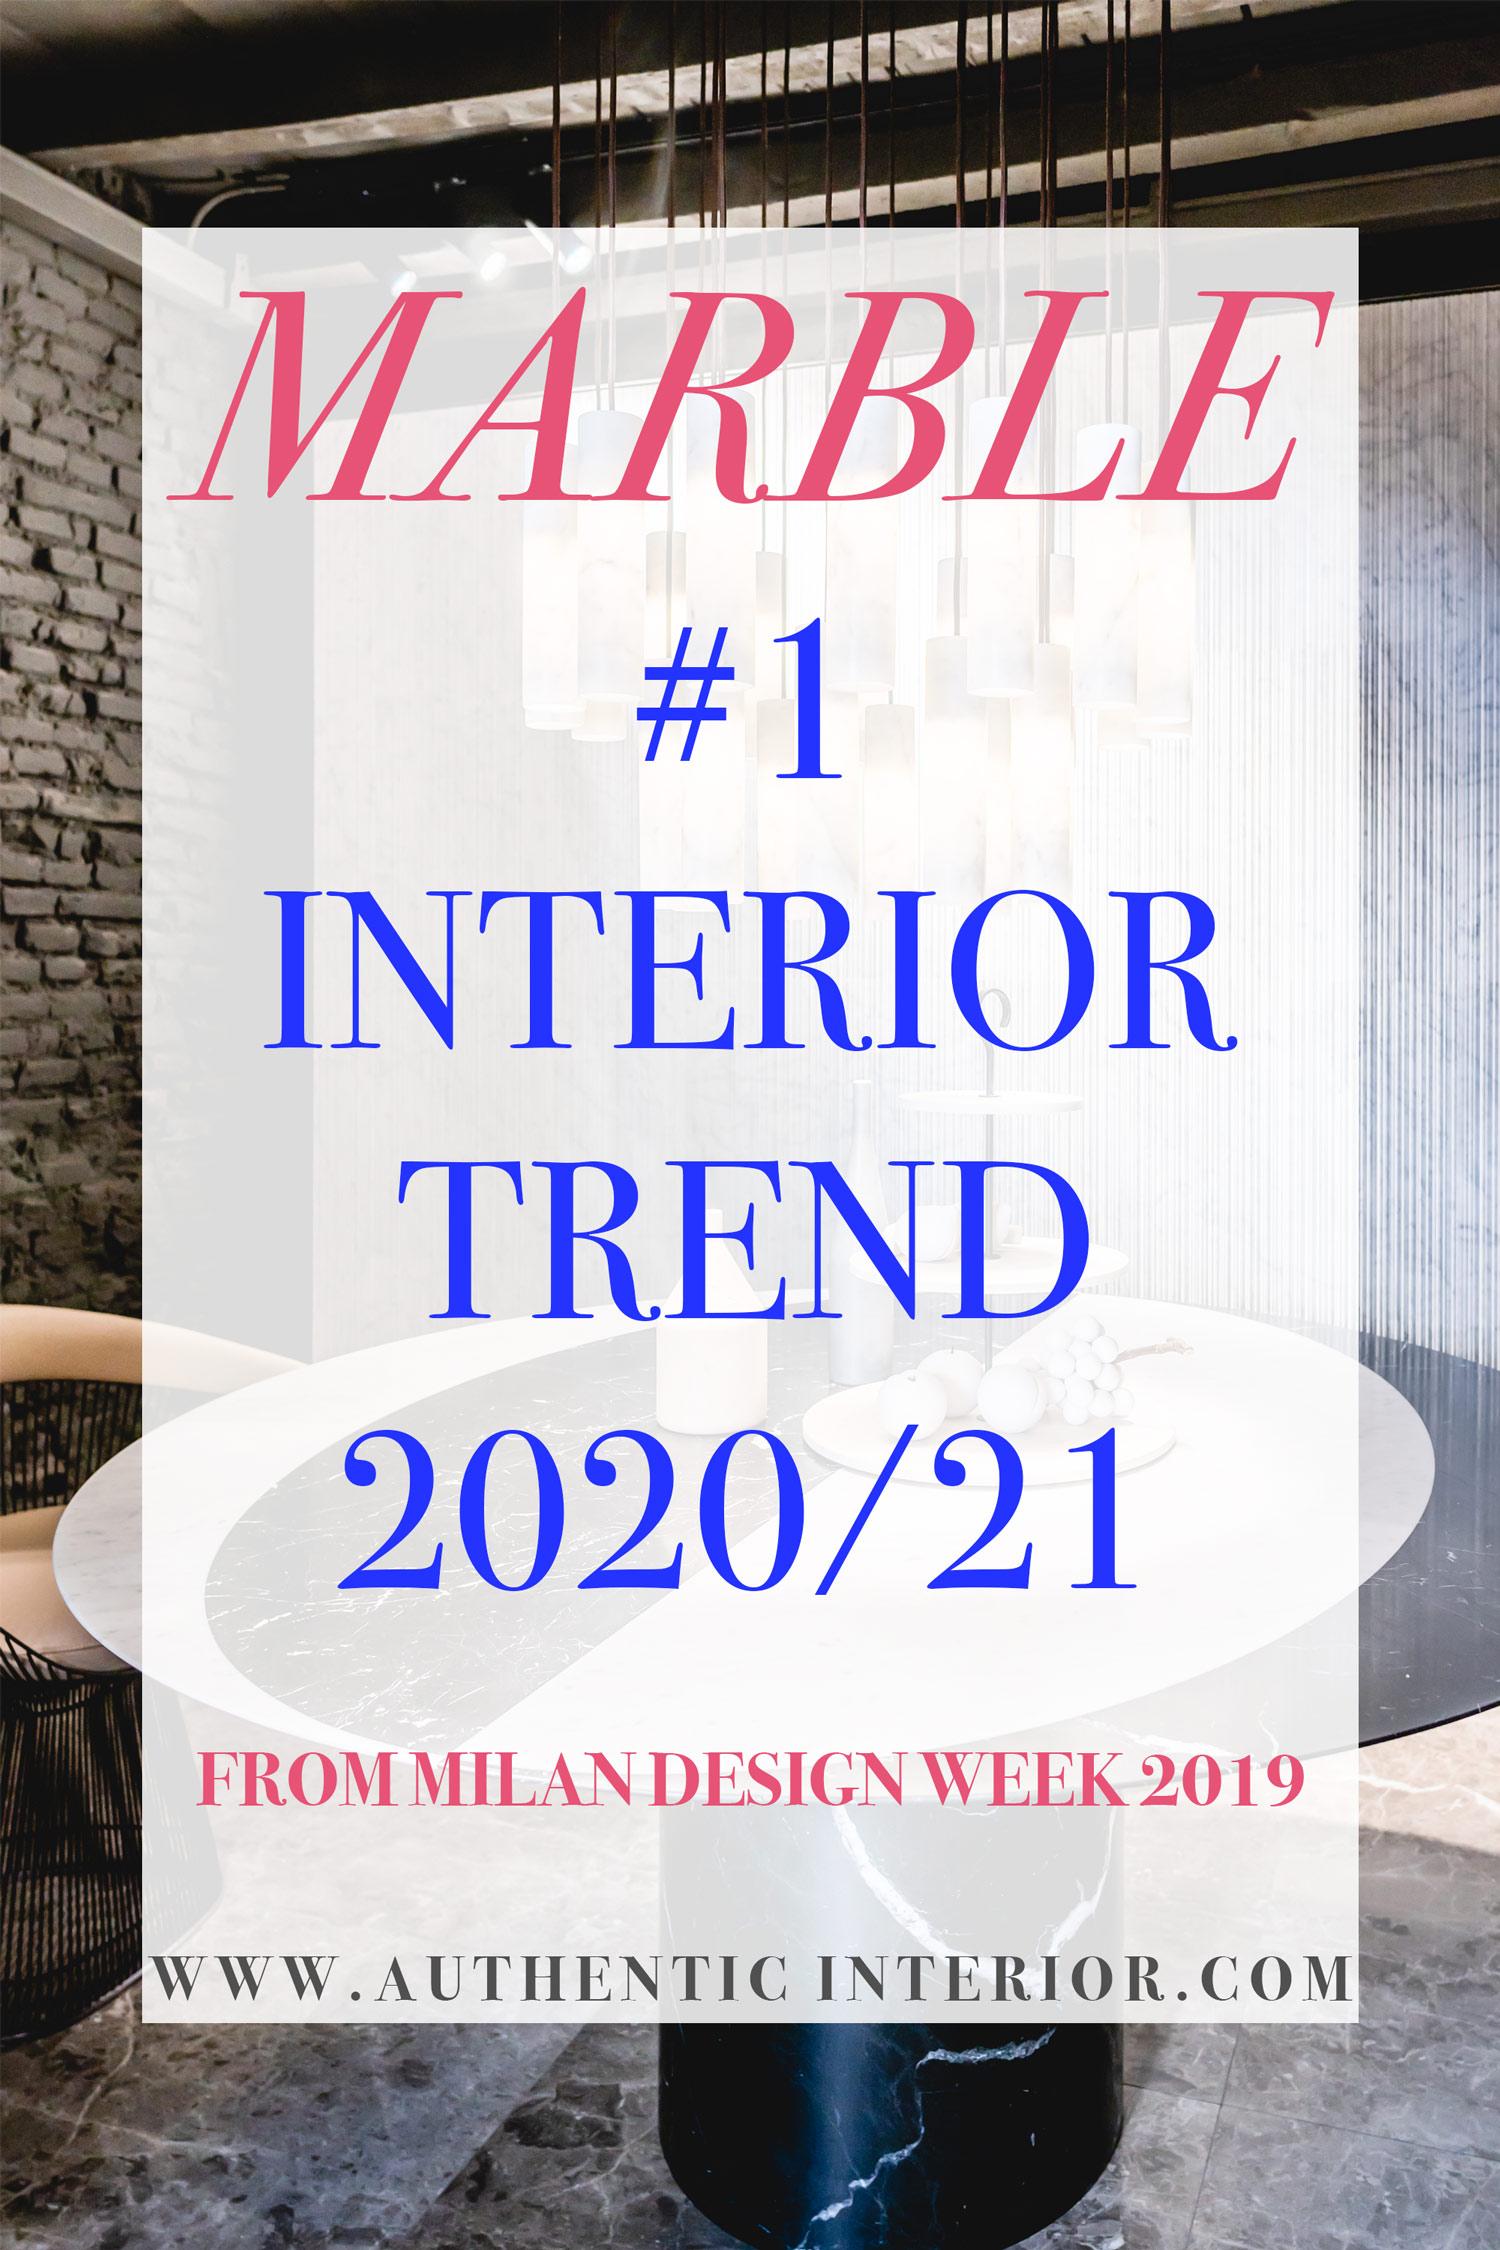 Interior design trends for 2020_Marble interior design trend_Authentic Interior design blog_interior design trends for 2020